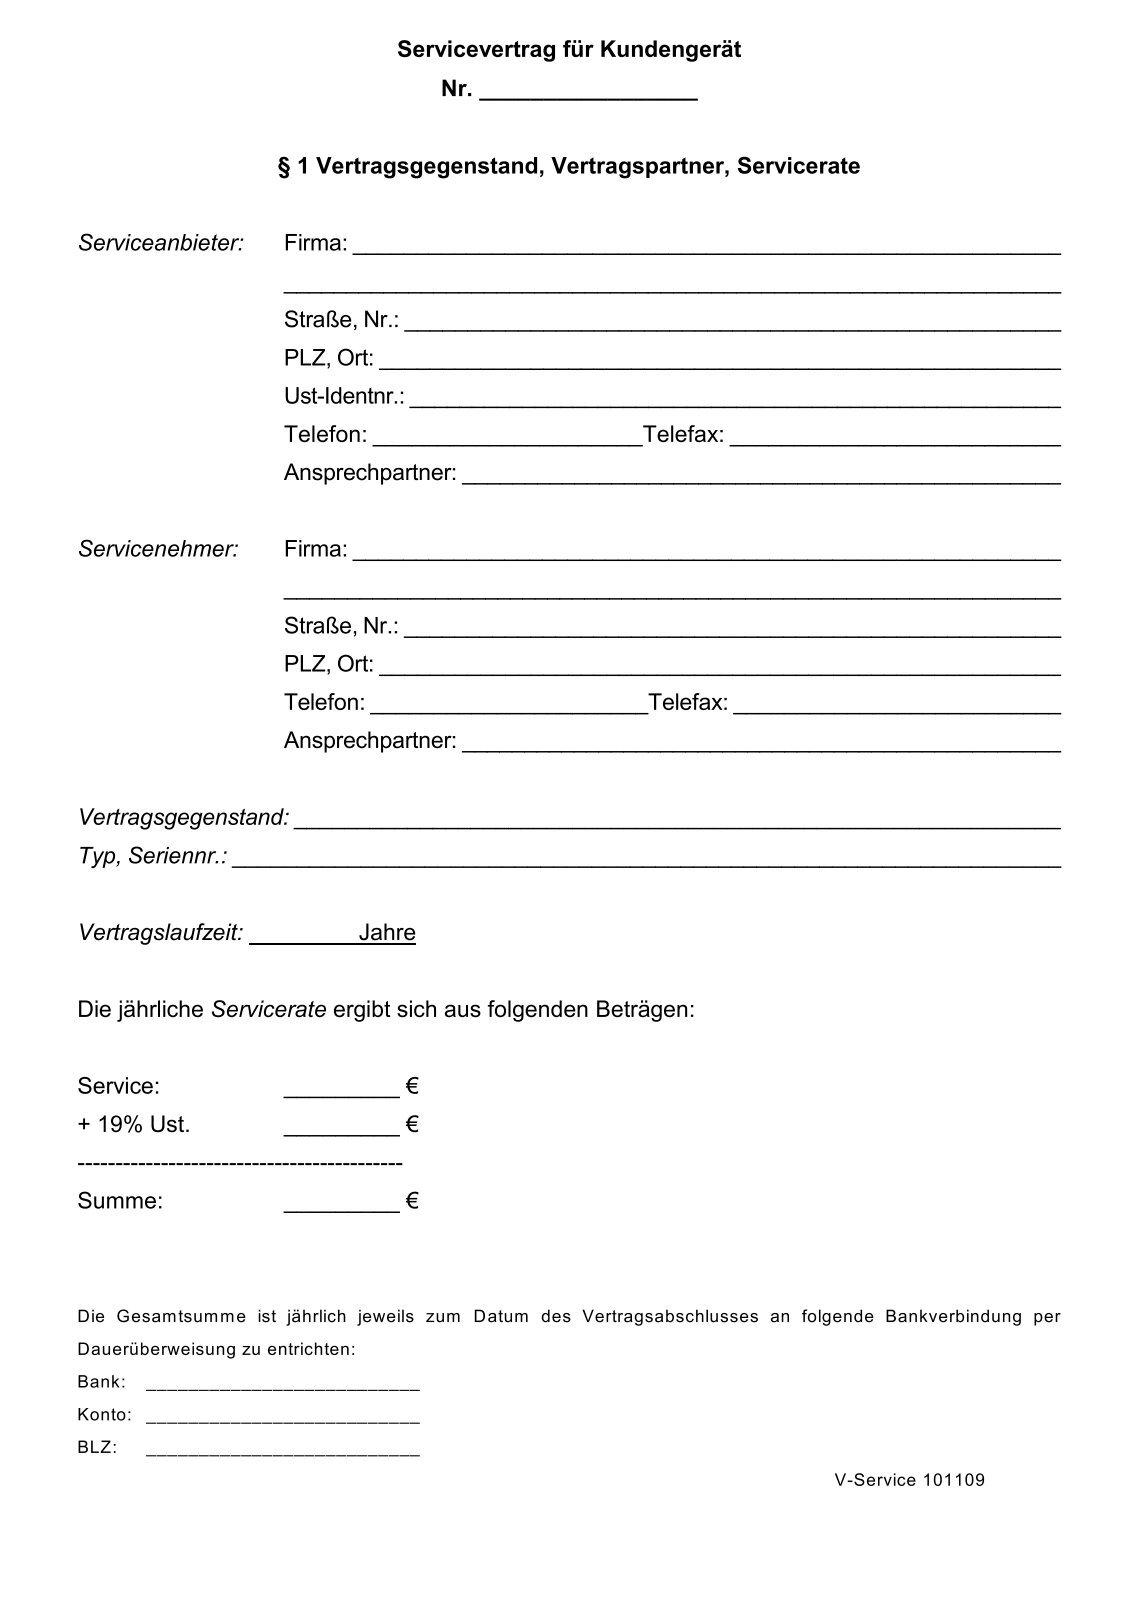 Großzügig Servicevertrag Vorlage Uk Ideen - Entry Level Resume ...